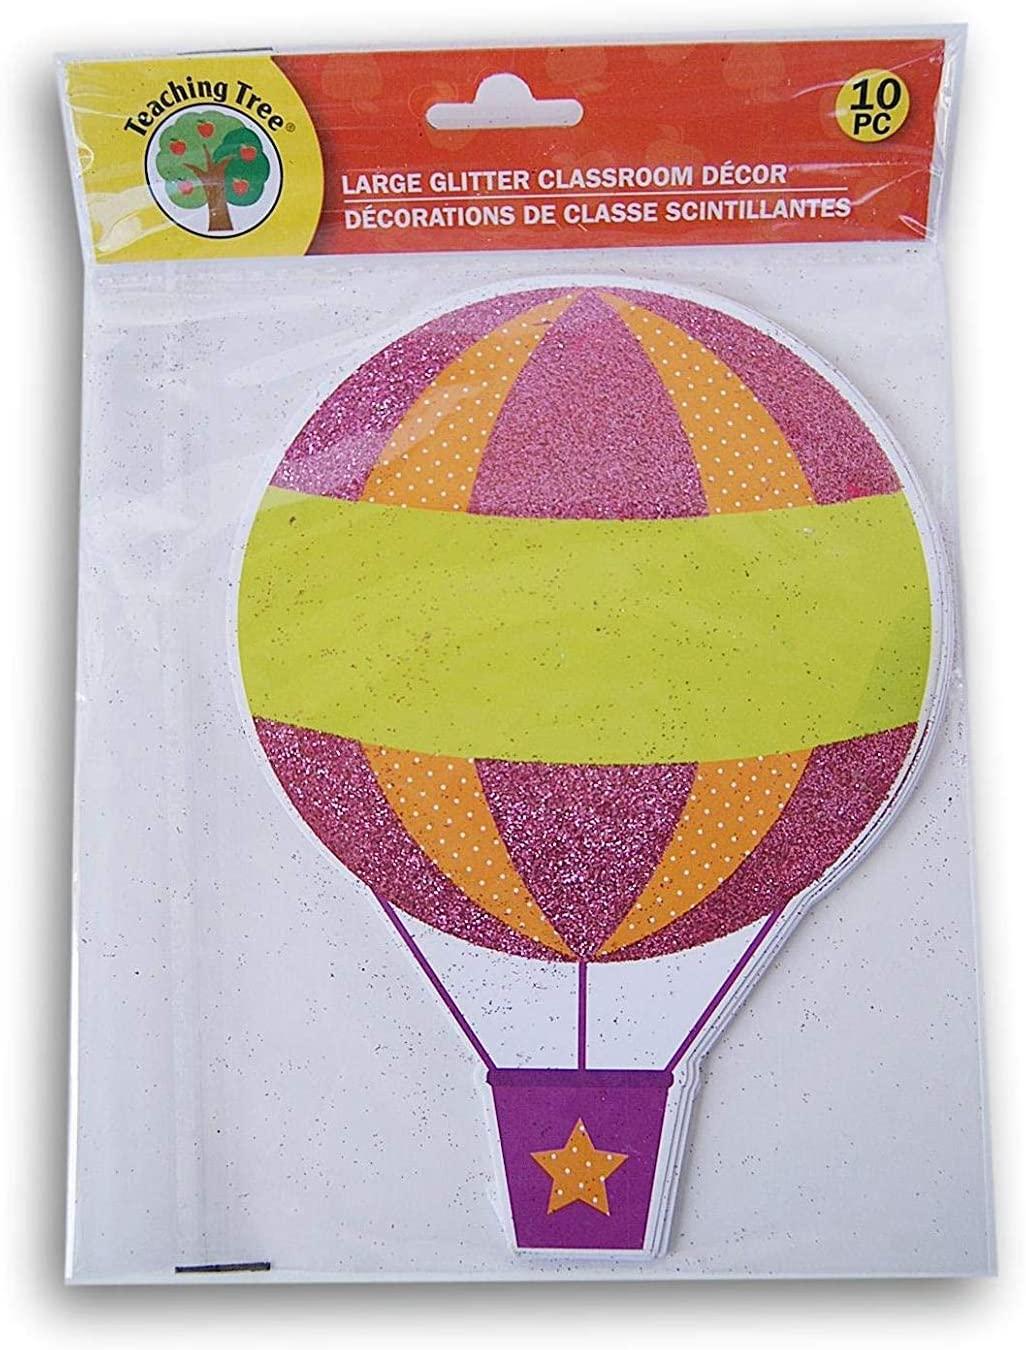 Hot Air Balloon Classroom Decor Glitter Paper Cut-Outs - 10 Count